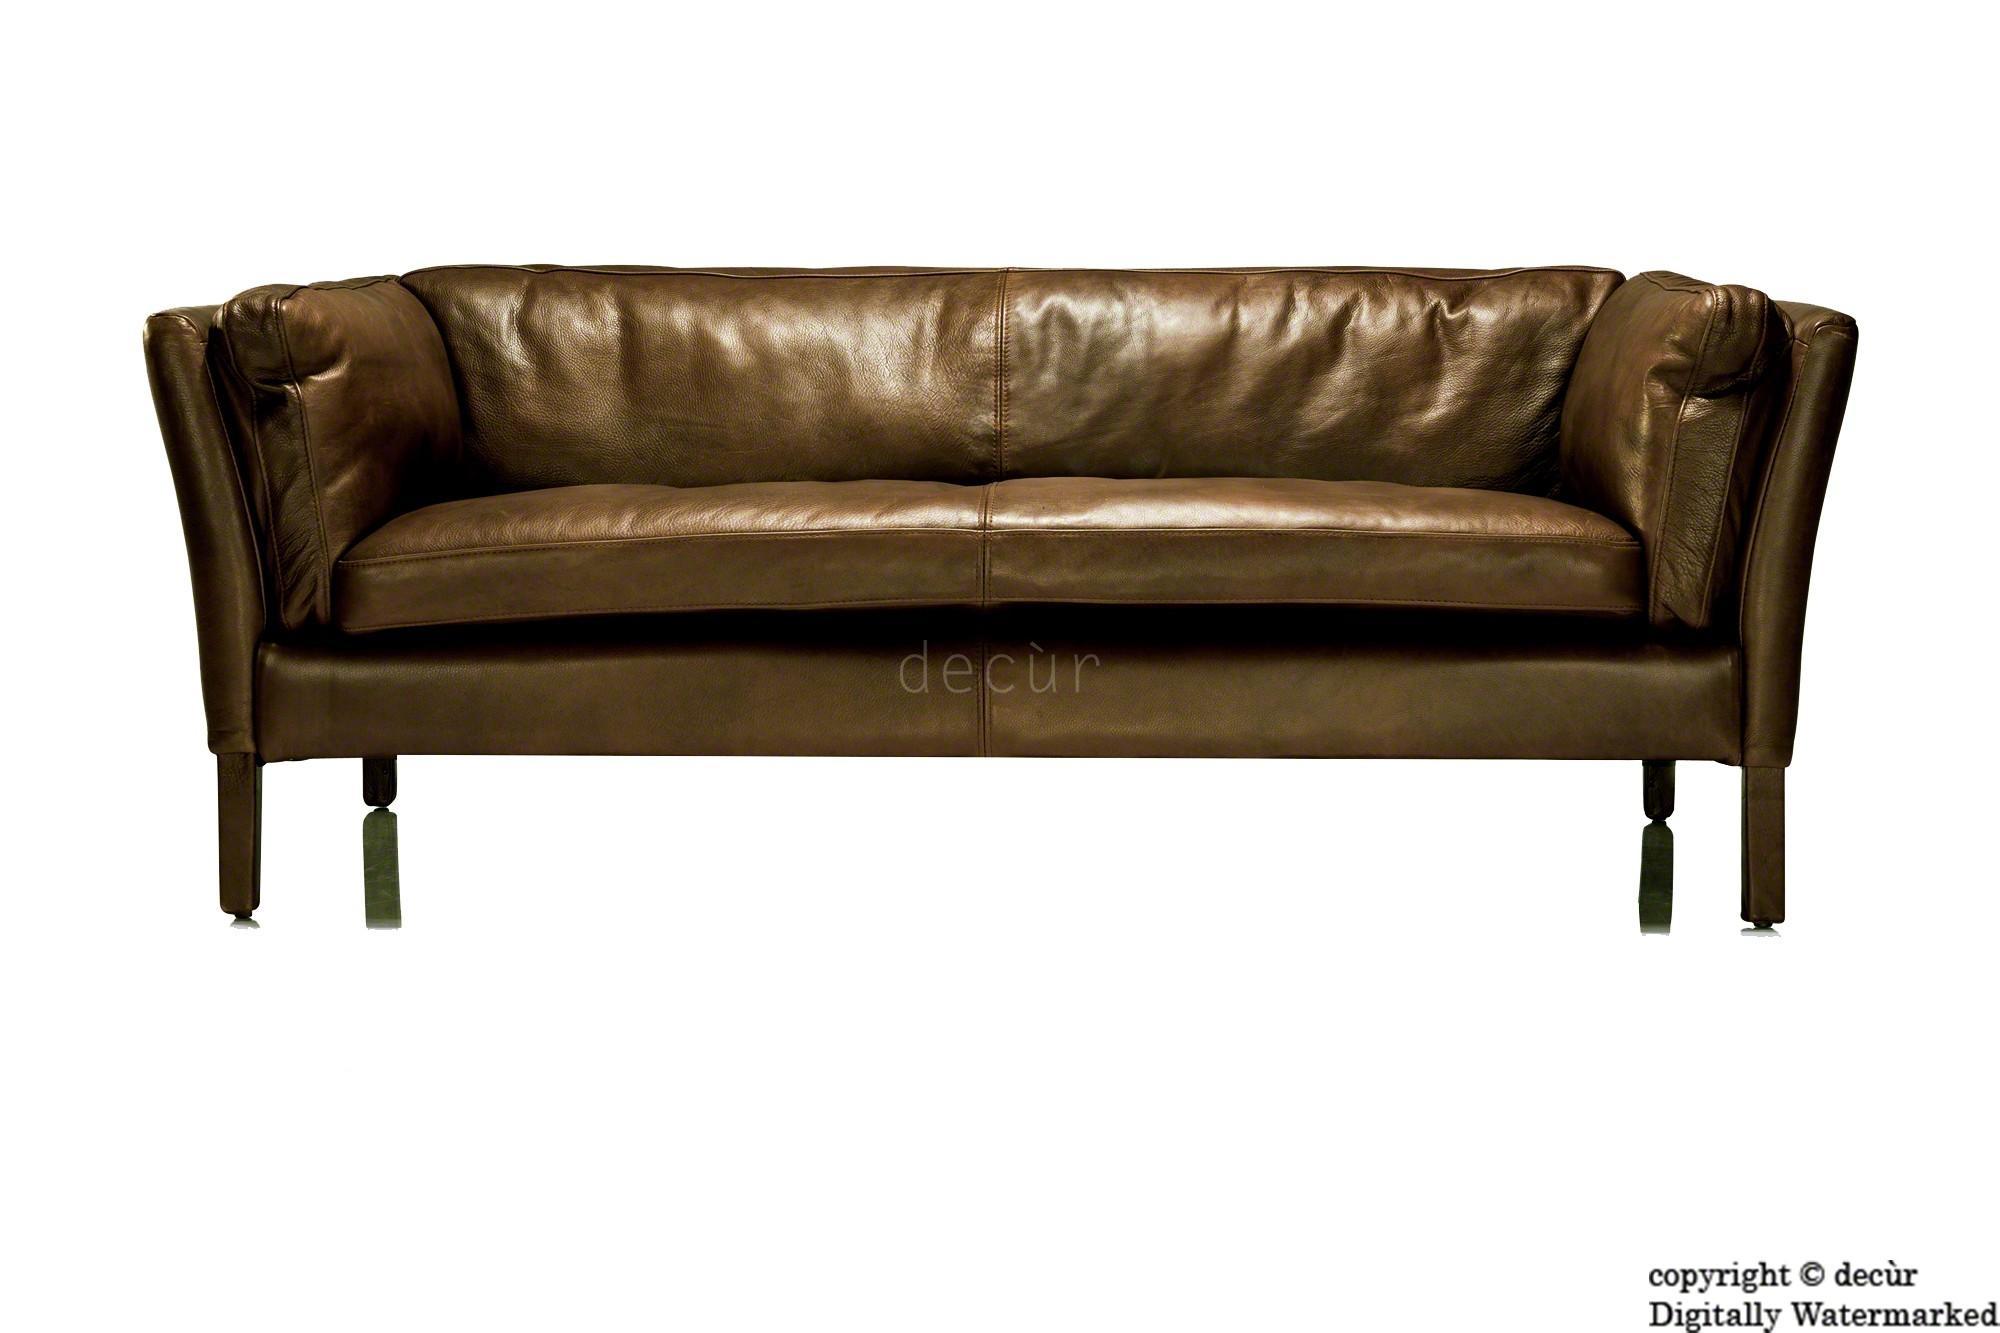 Bespoke Designer Sofas, Footstools, Bespoke Footstools, Bespoke With Regard To Savoy Leather Sofas (View 12 of 20)